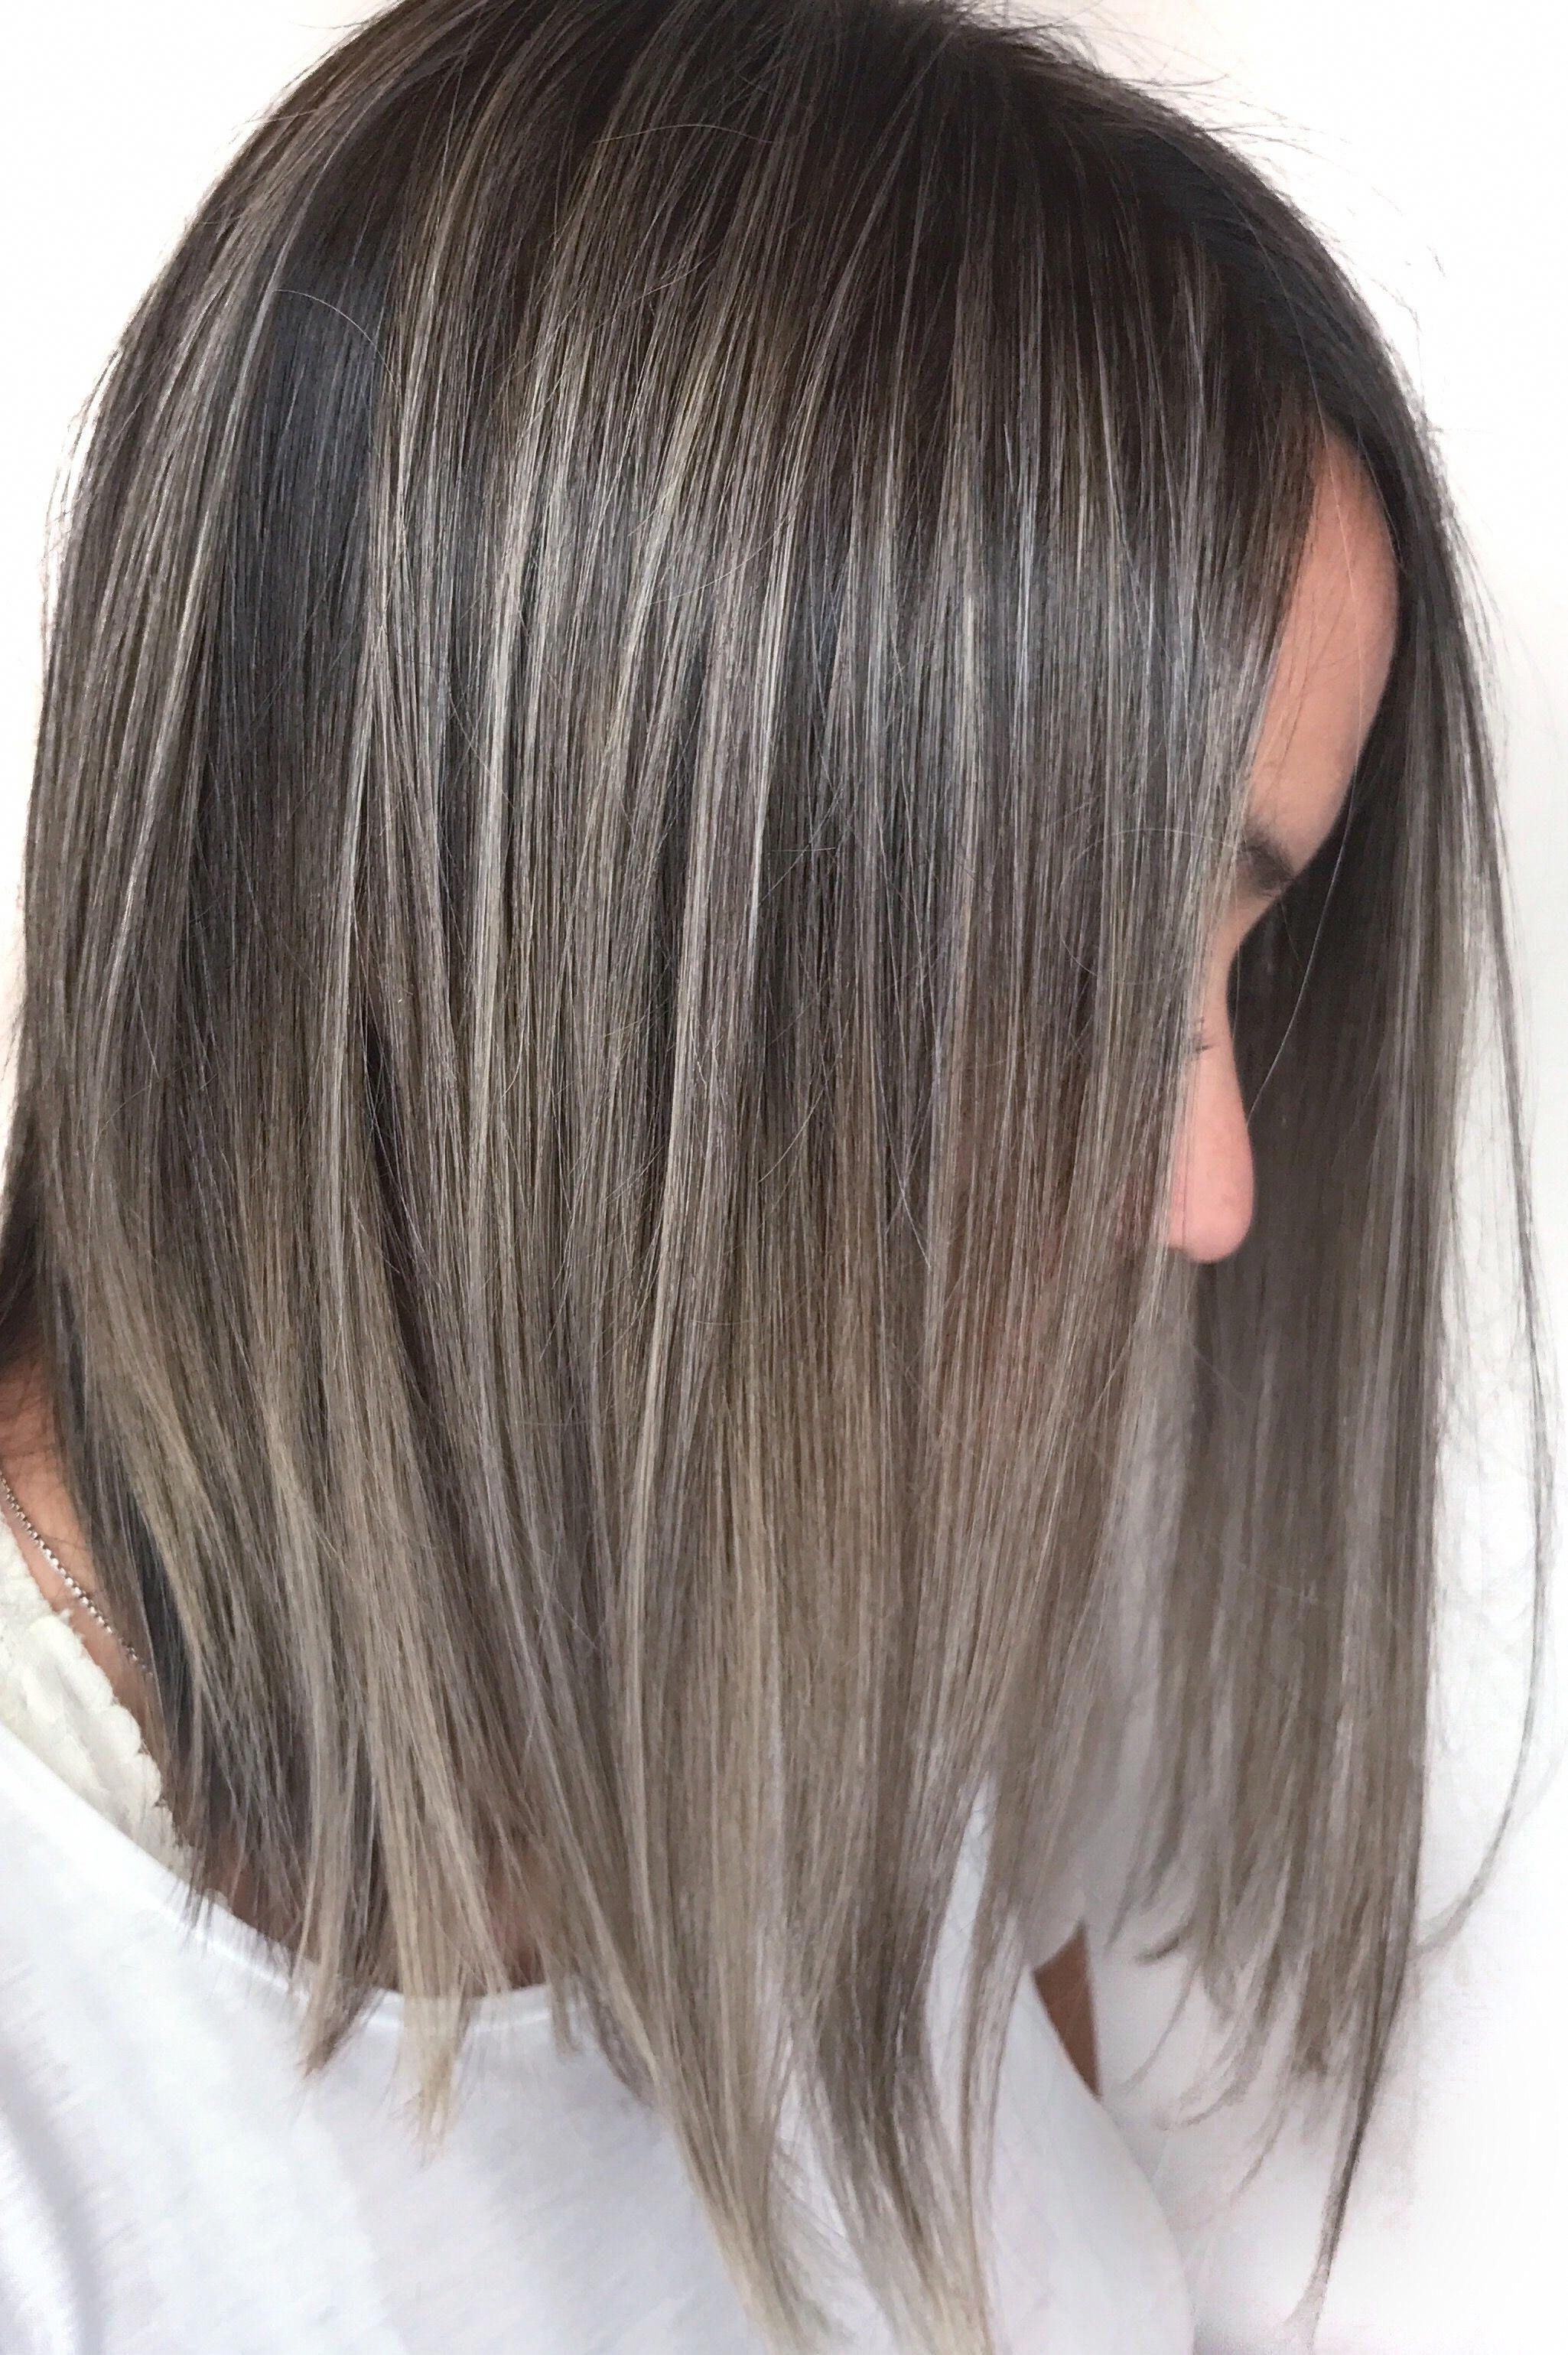 Silver Highlights Silver Foilayage Balayage Grey Hair Grey Balayage Fine Brown Hair Balayage Colored Hair Tips Hair Styles